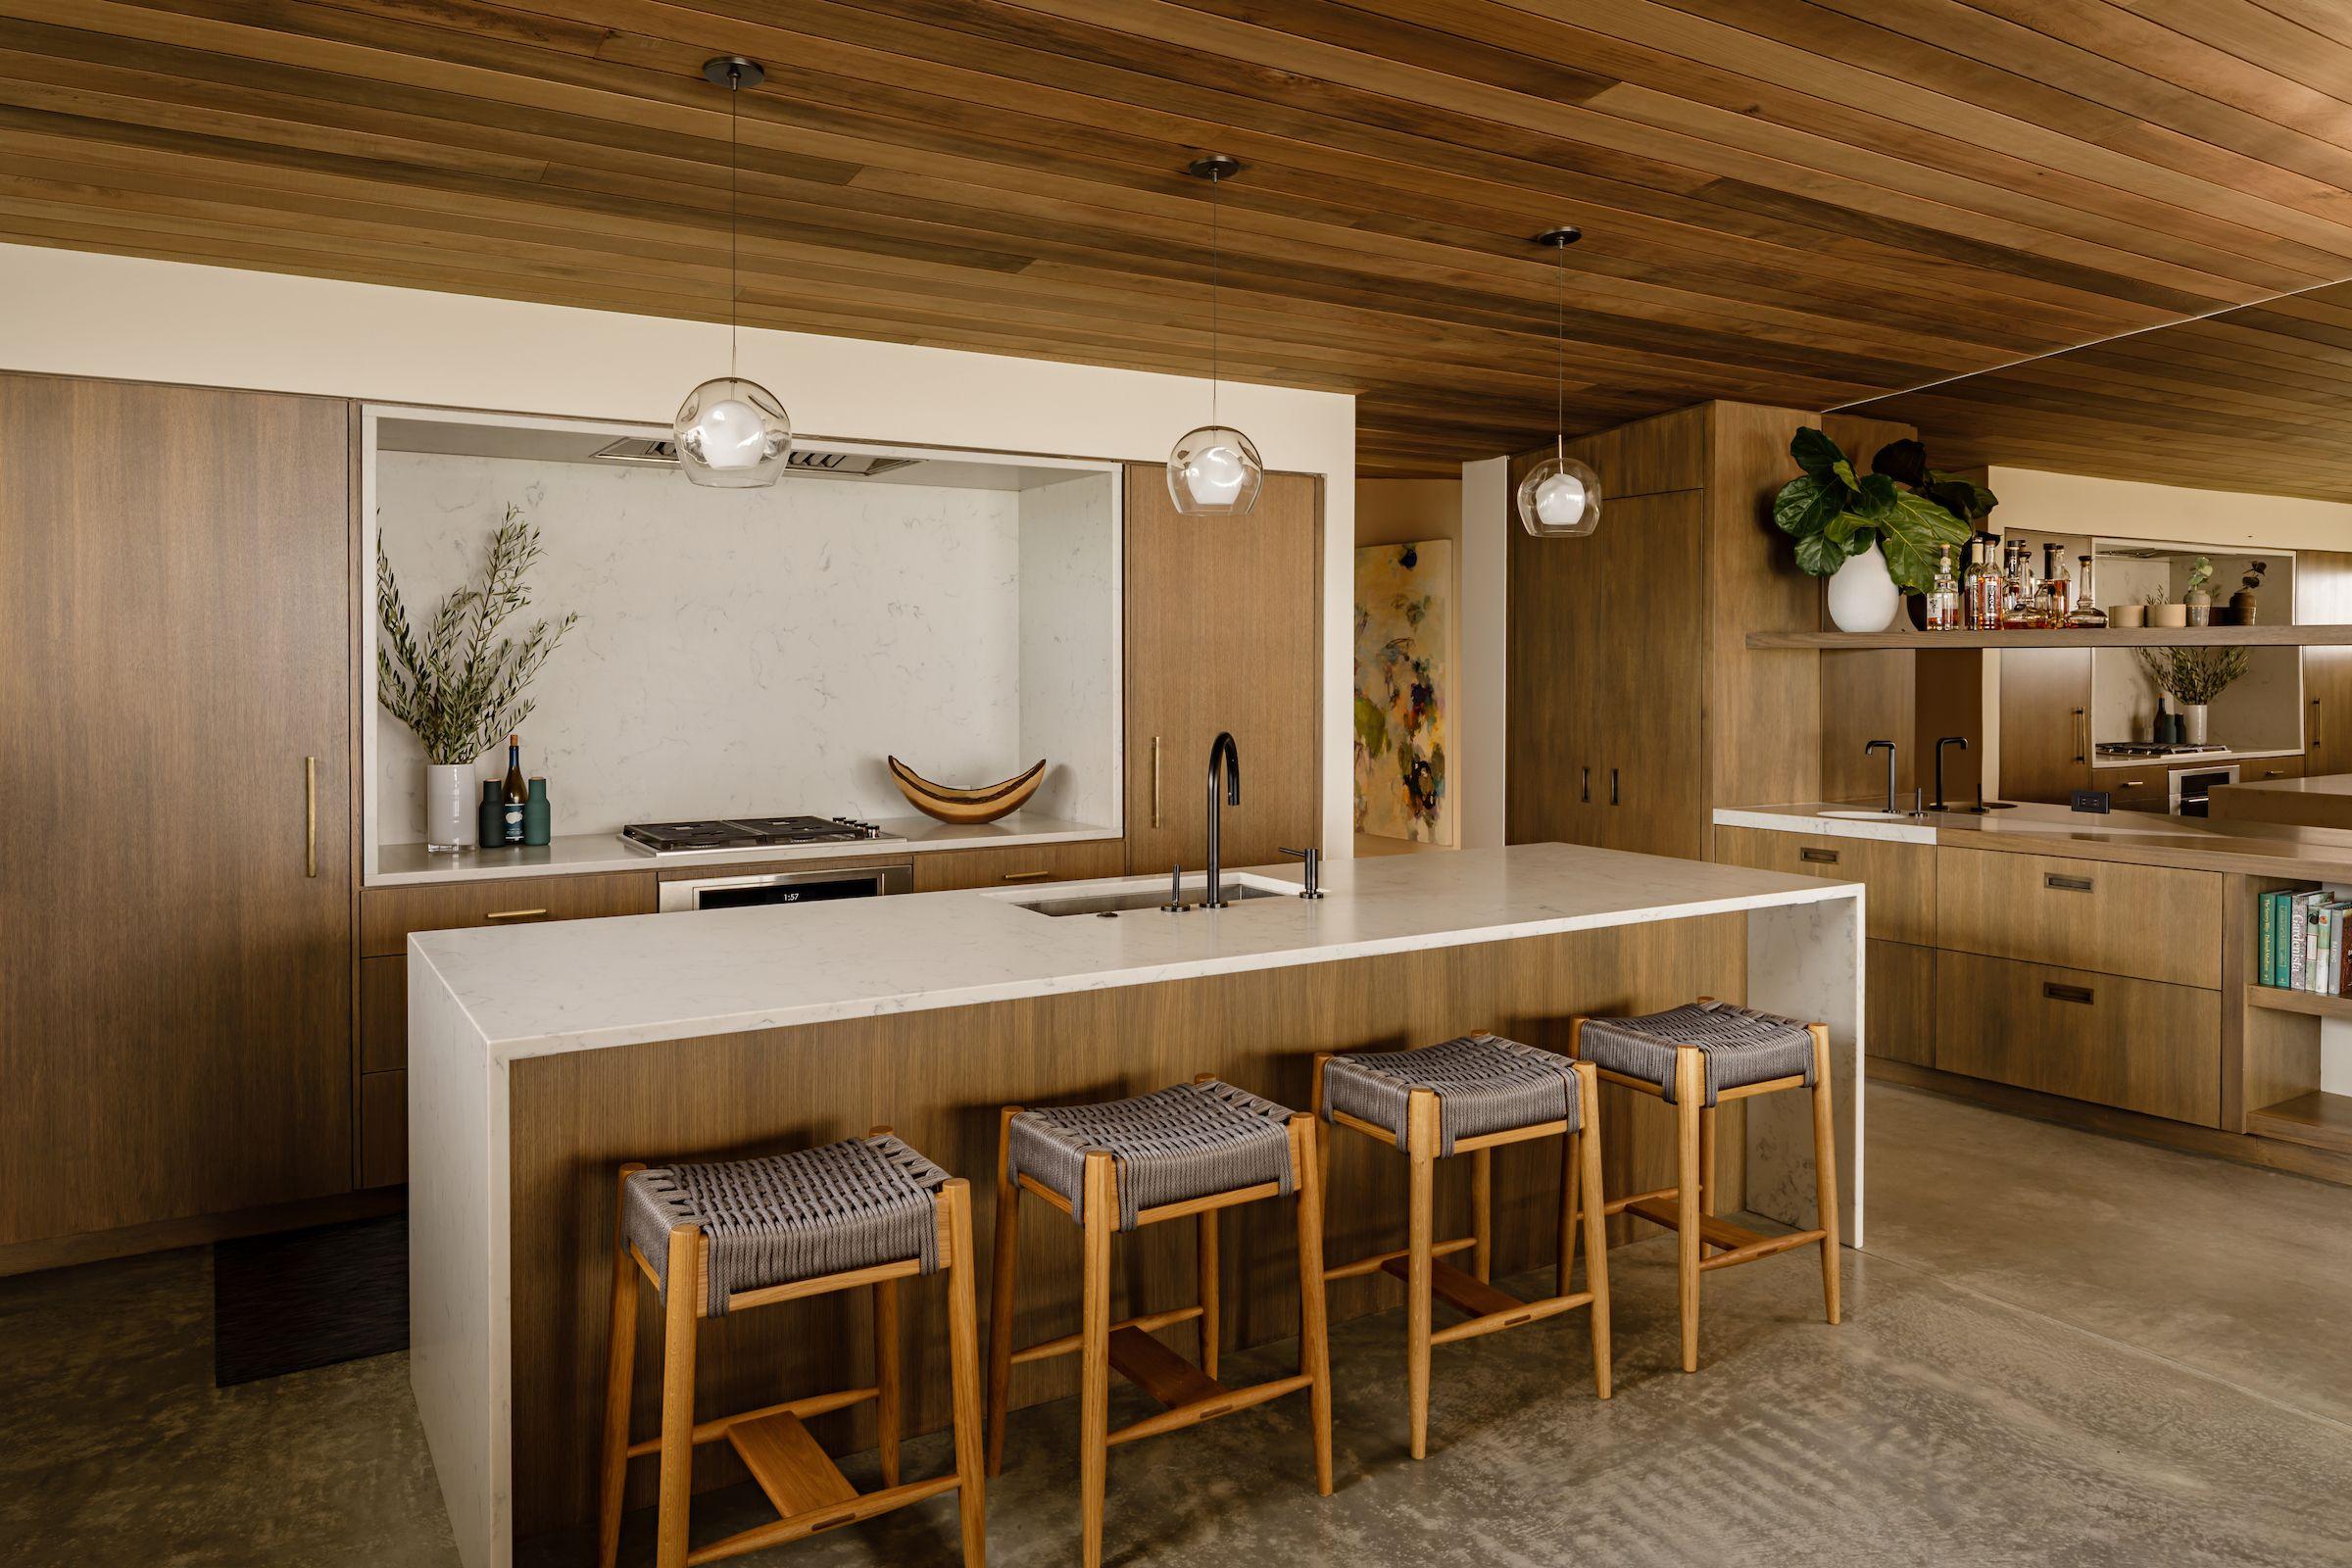 Best Photos from Arch Cape | Home decor kitchen, Coastal ...